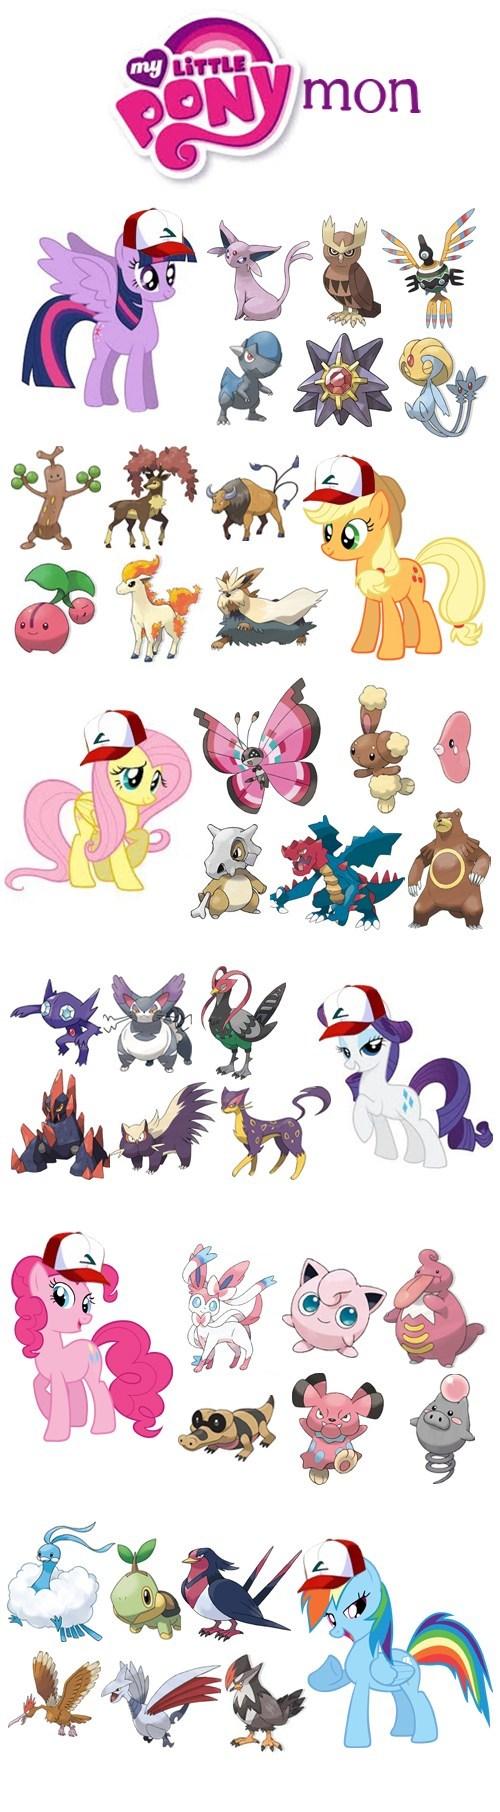 Mane Six's teams in Pokémon